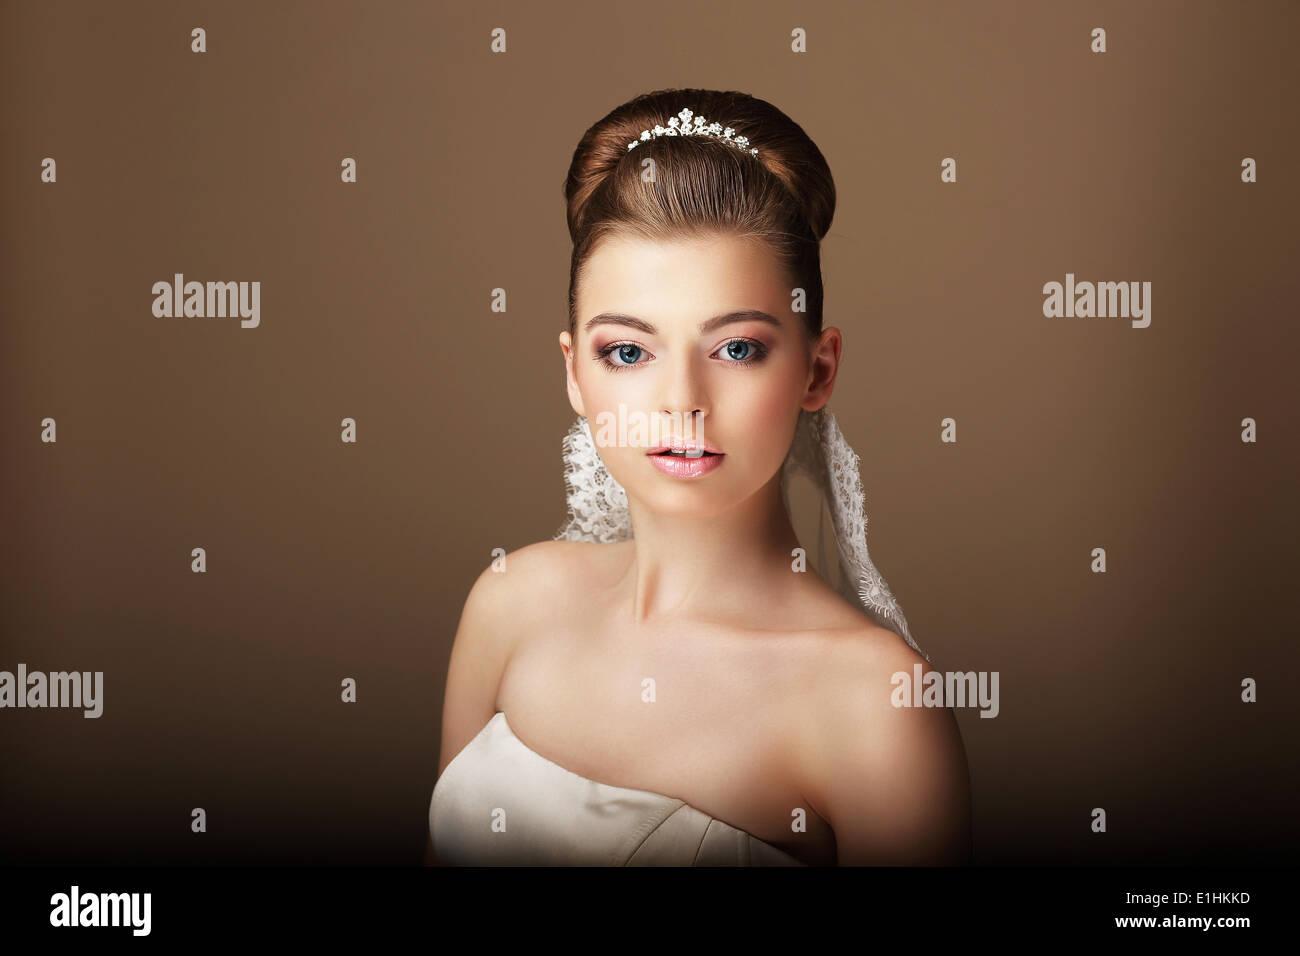 Retrato de joven morenita con maquillaje natural Imagen De Stock